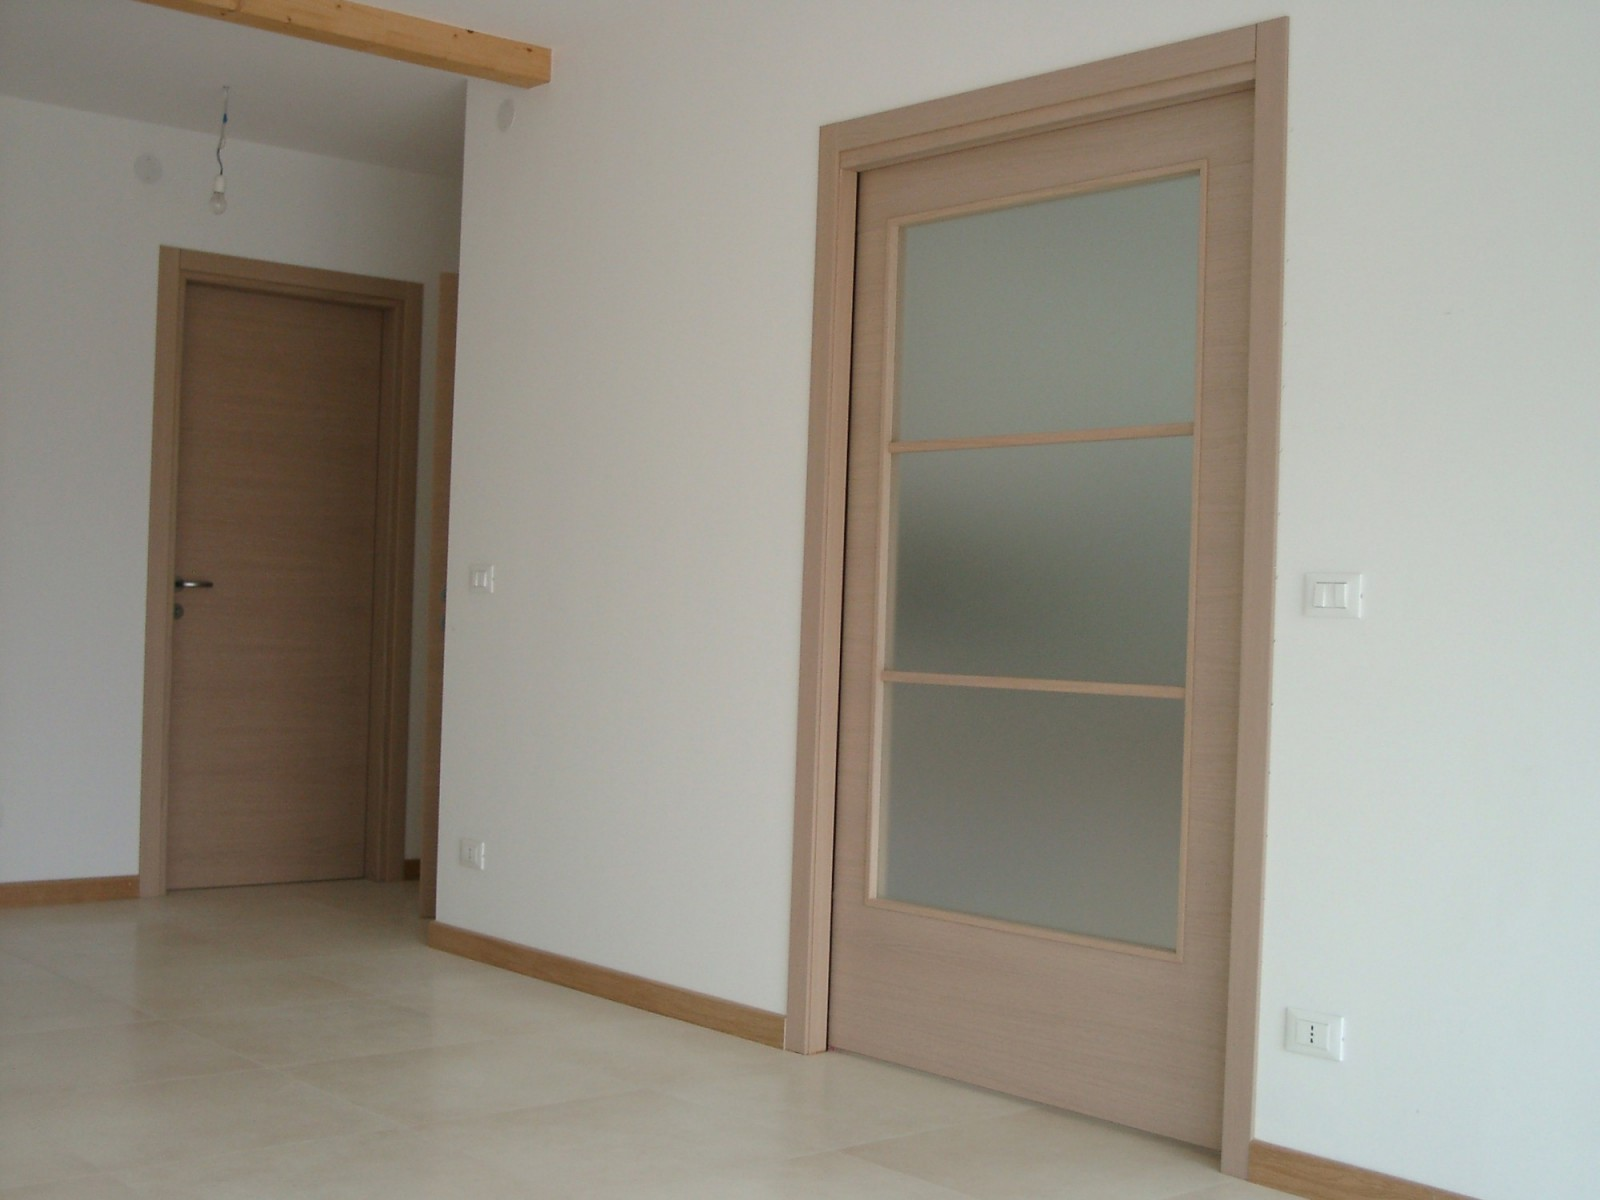 Porte scorrevoli con vetro stunning porte scorrevoli - Porta scorrevole vetro ...